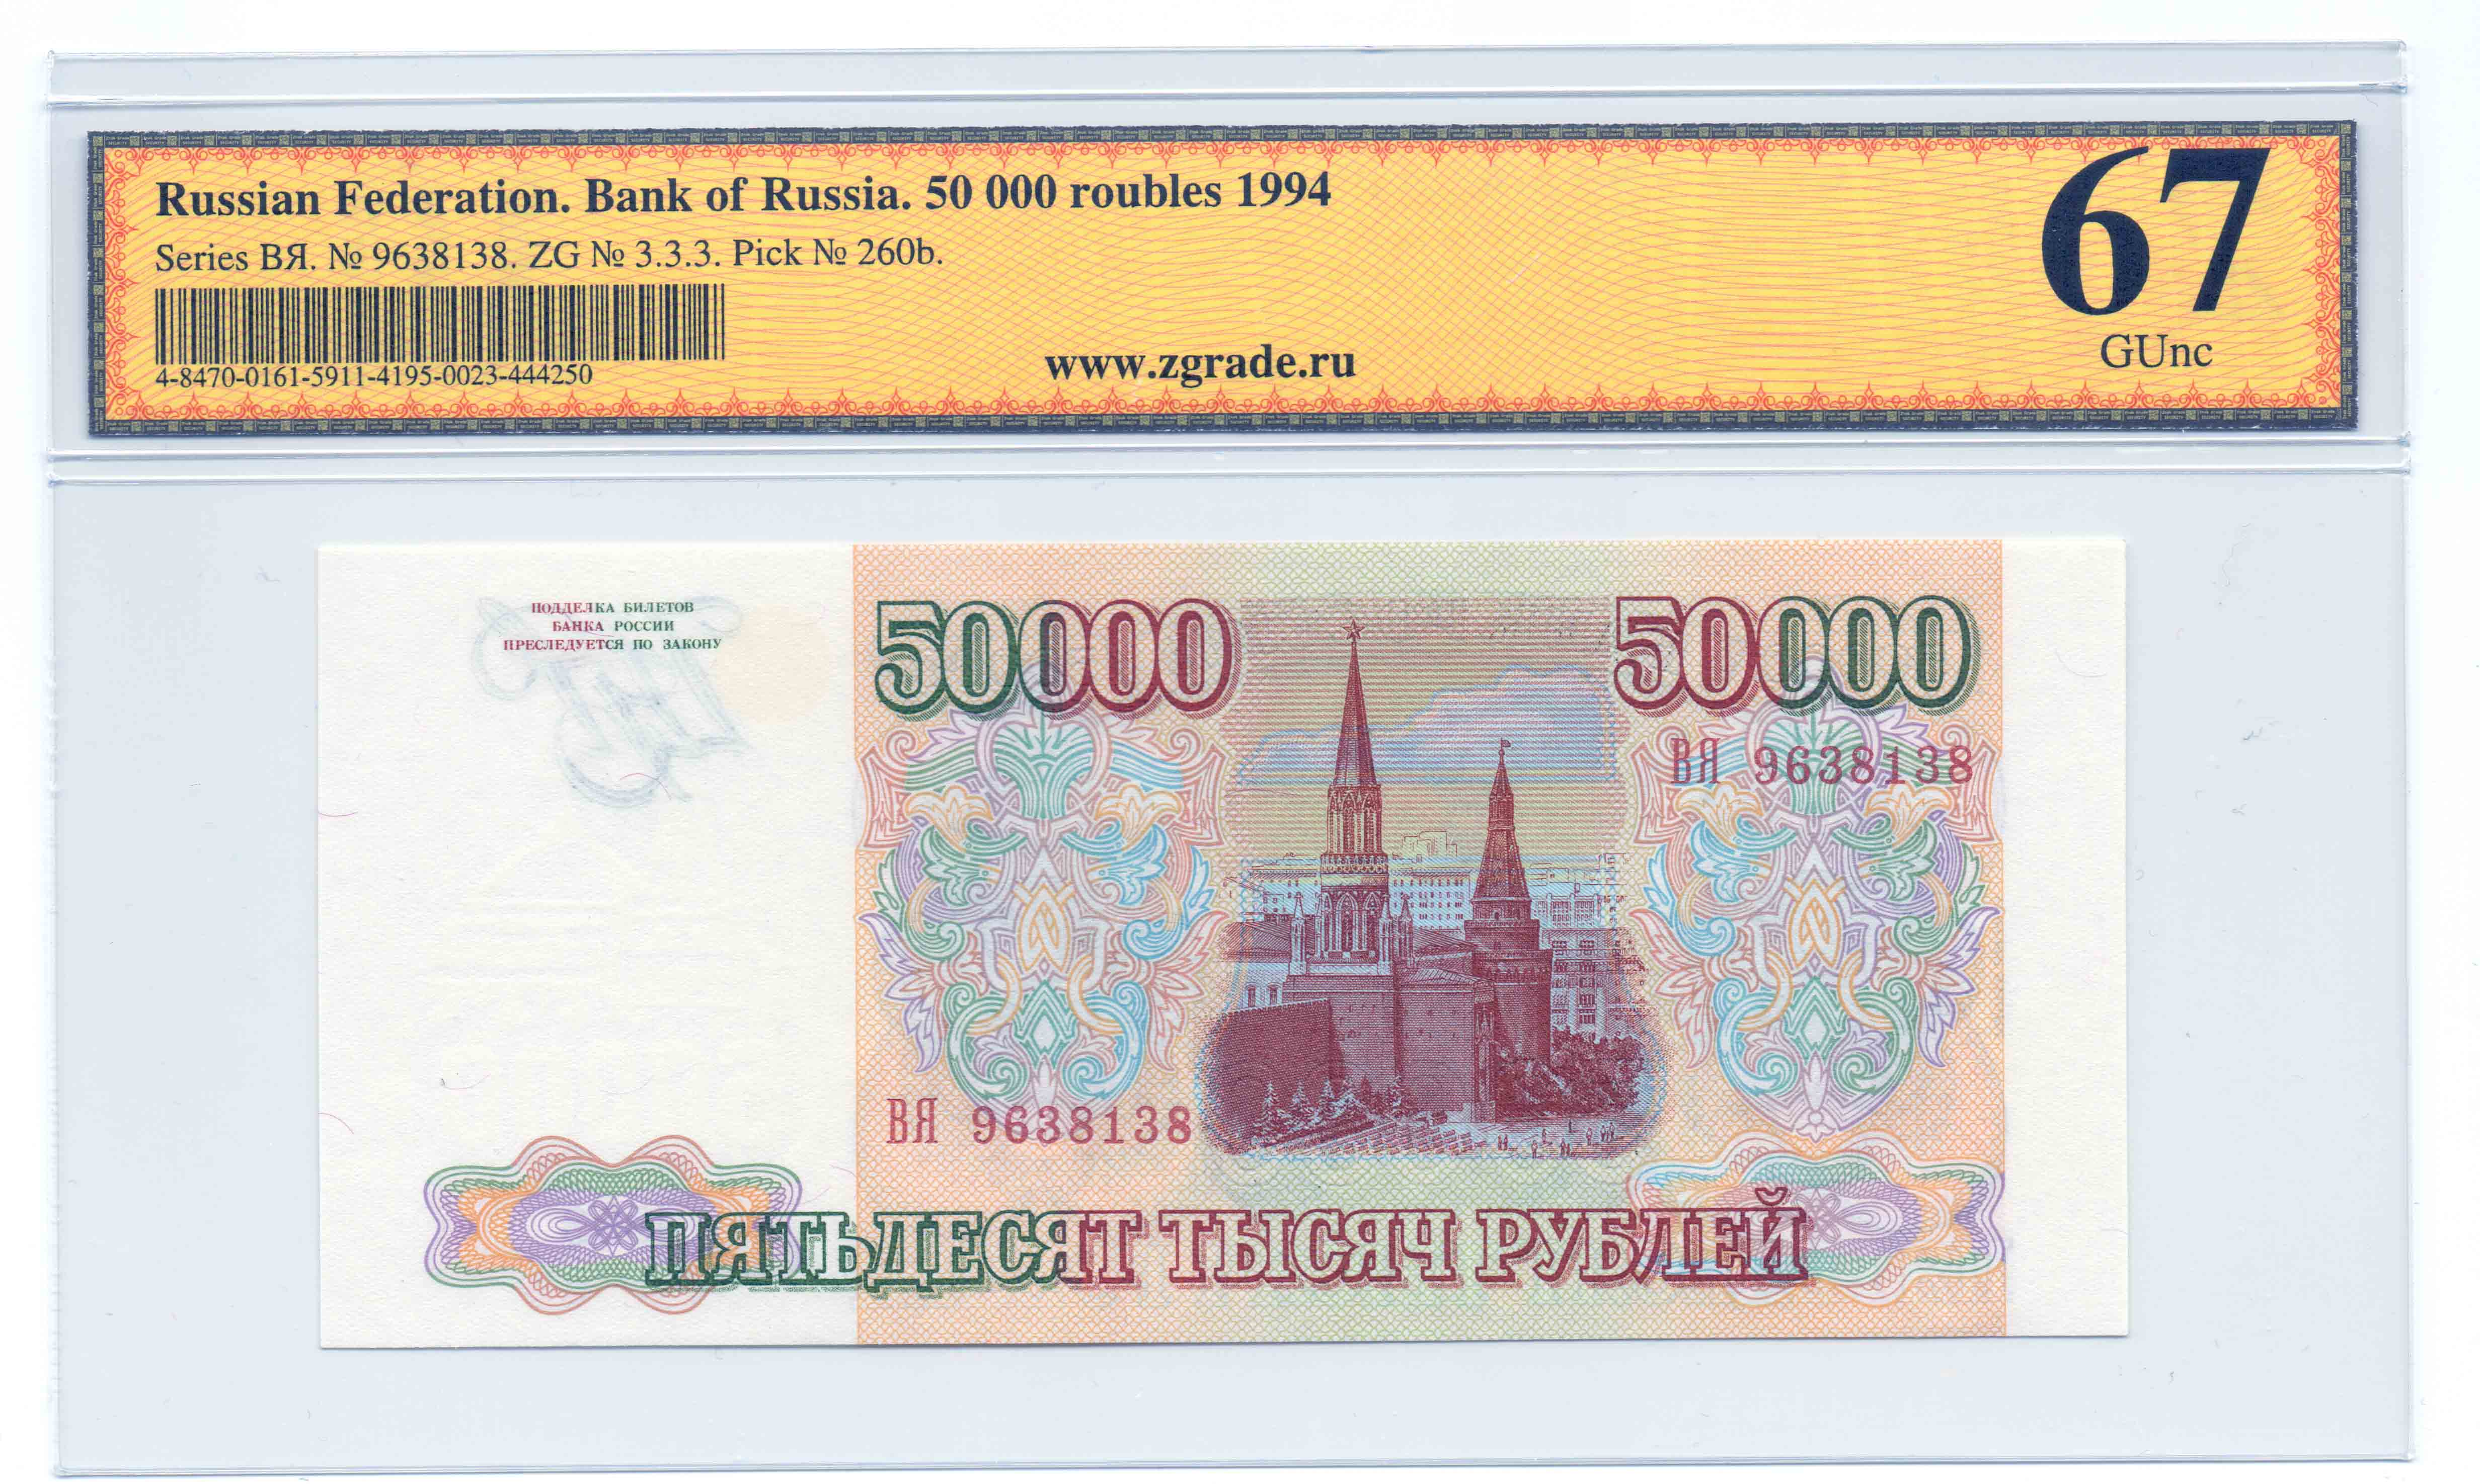 50 000 рублей 1994 г. ВЯ 9638138 ZG № 3.2.5. 68 GUnc Pick.260b  #Б001-002